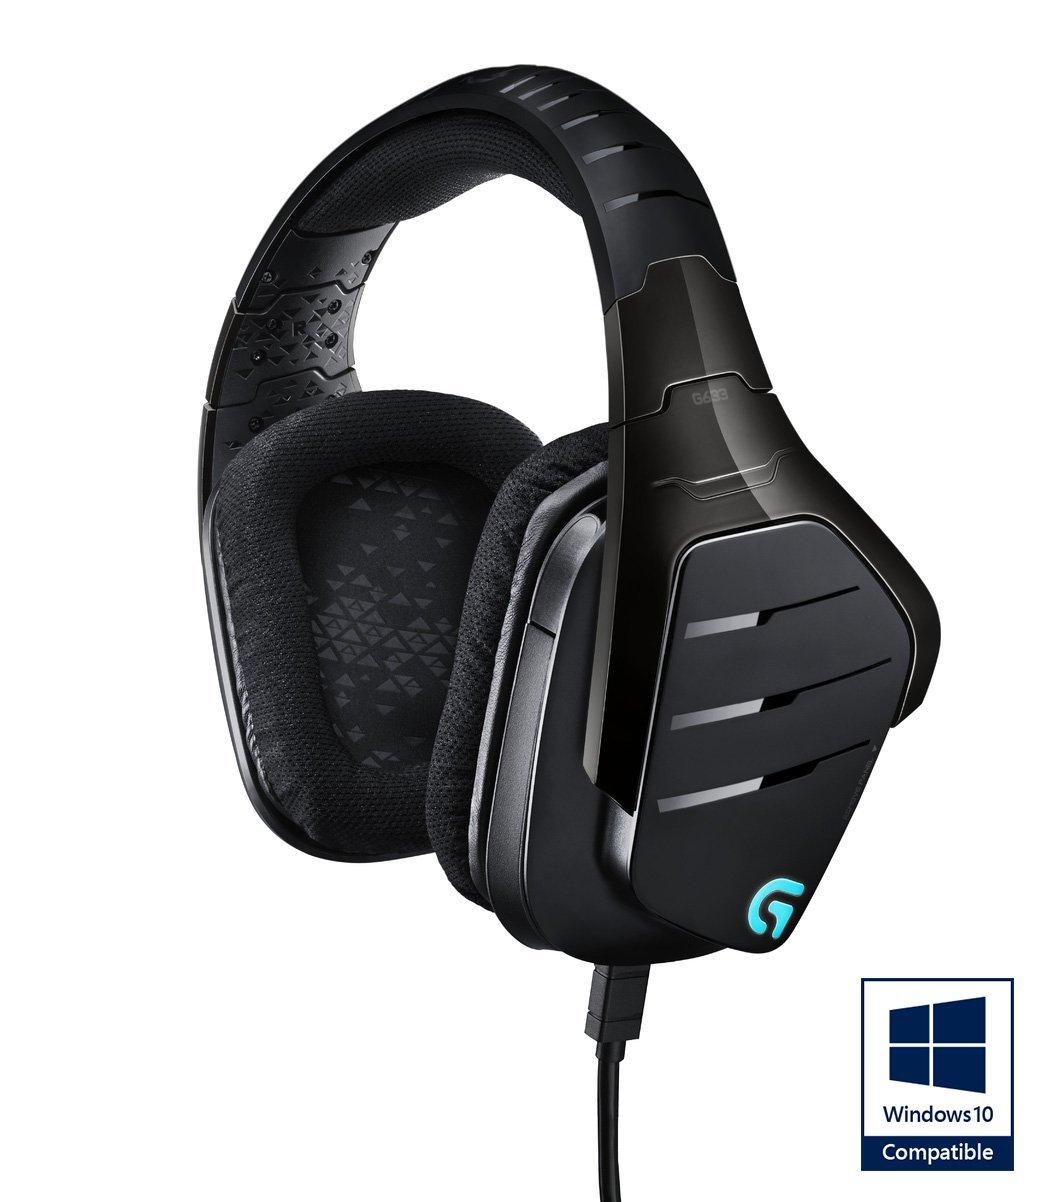 Logitech G633 Artemis Spectrum 7.1 Headset für 81,19€ (Amazon.co.uk)